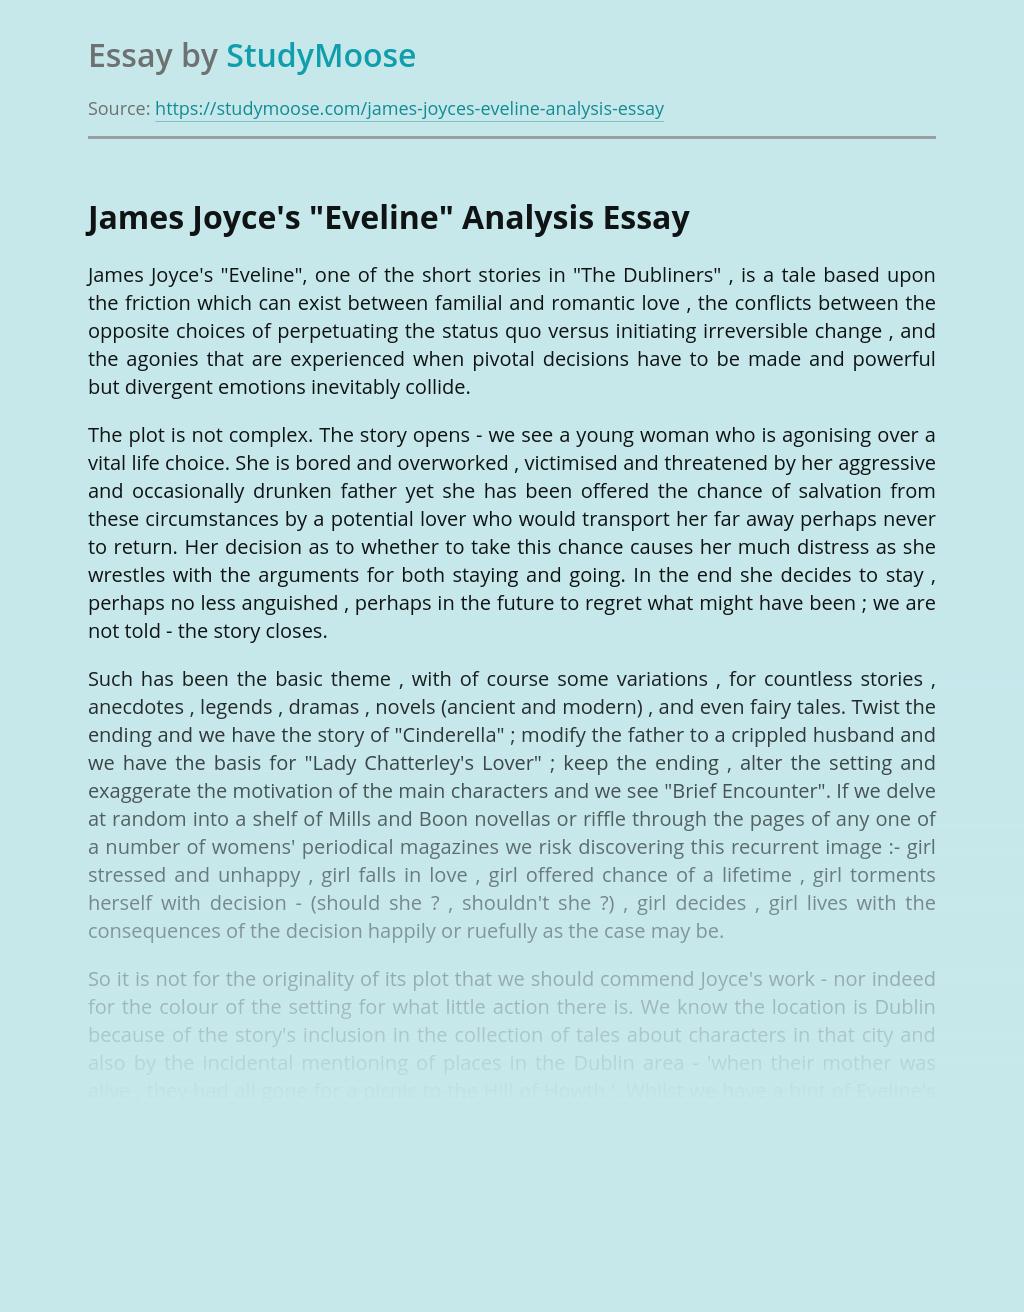 Analysis of James Joyce's Short Story